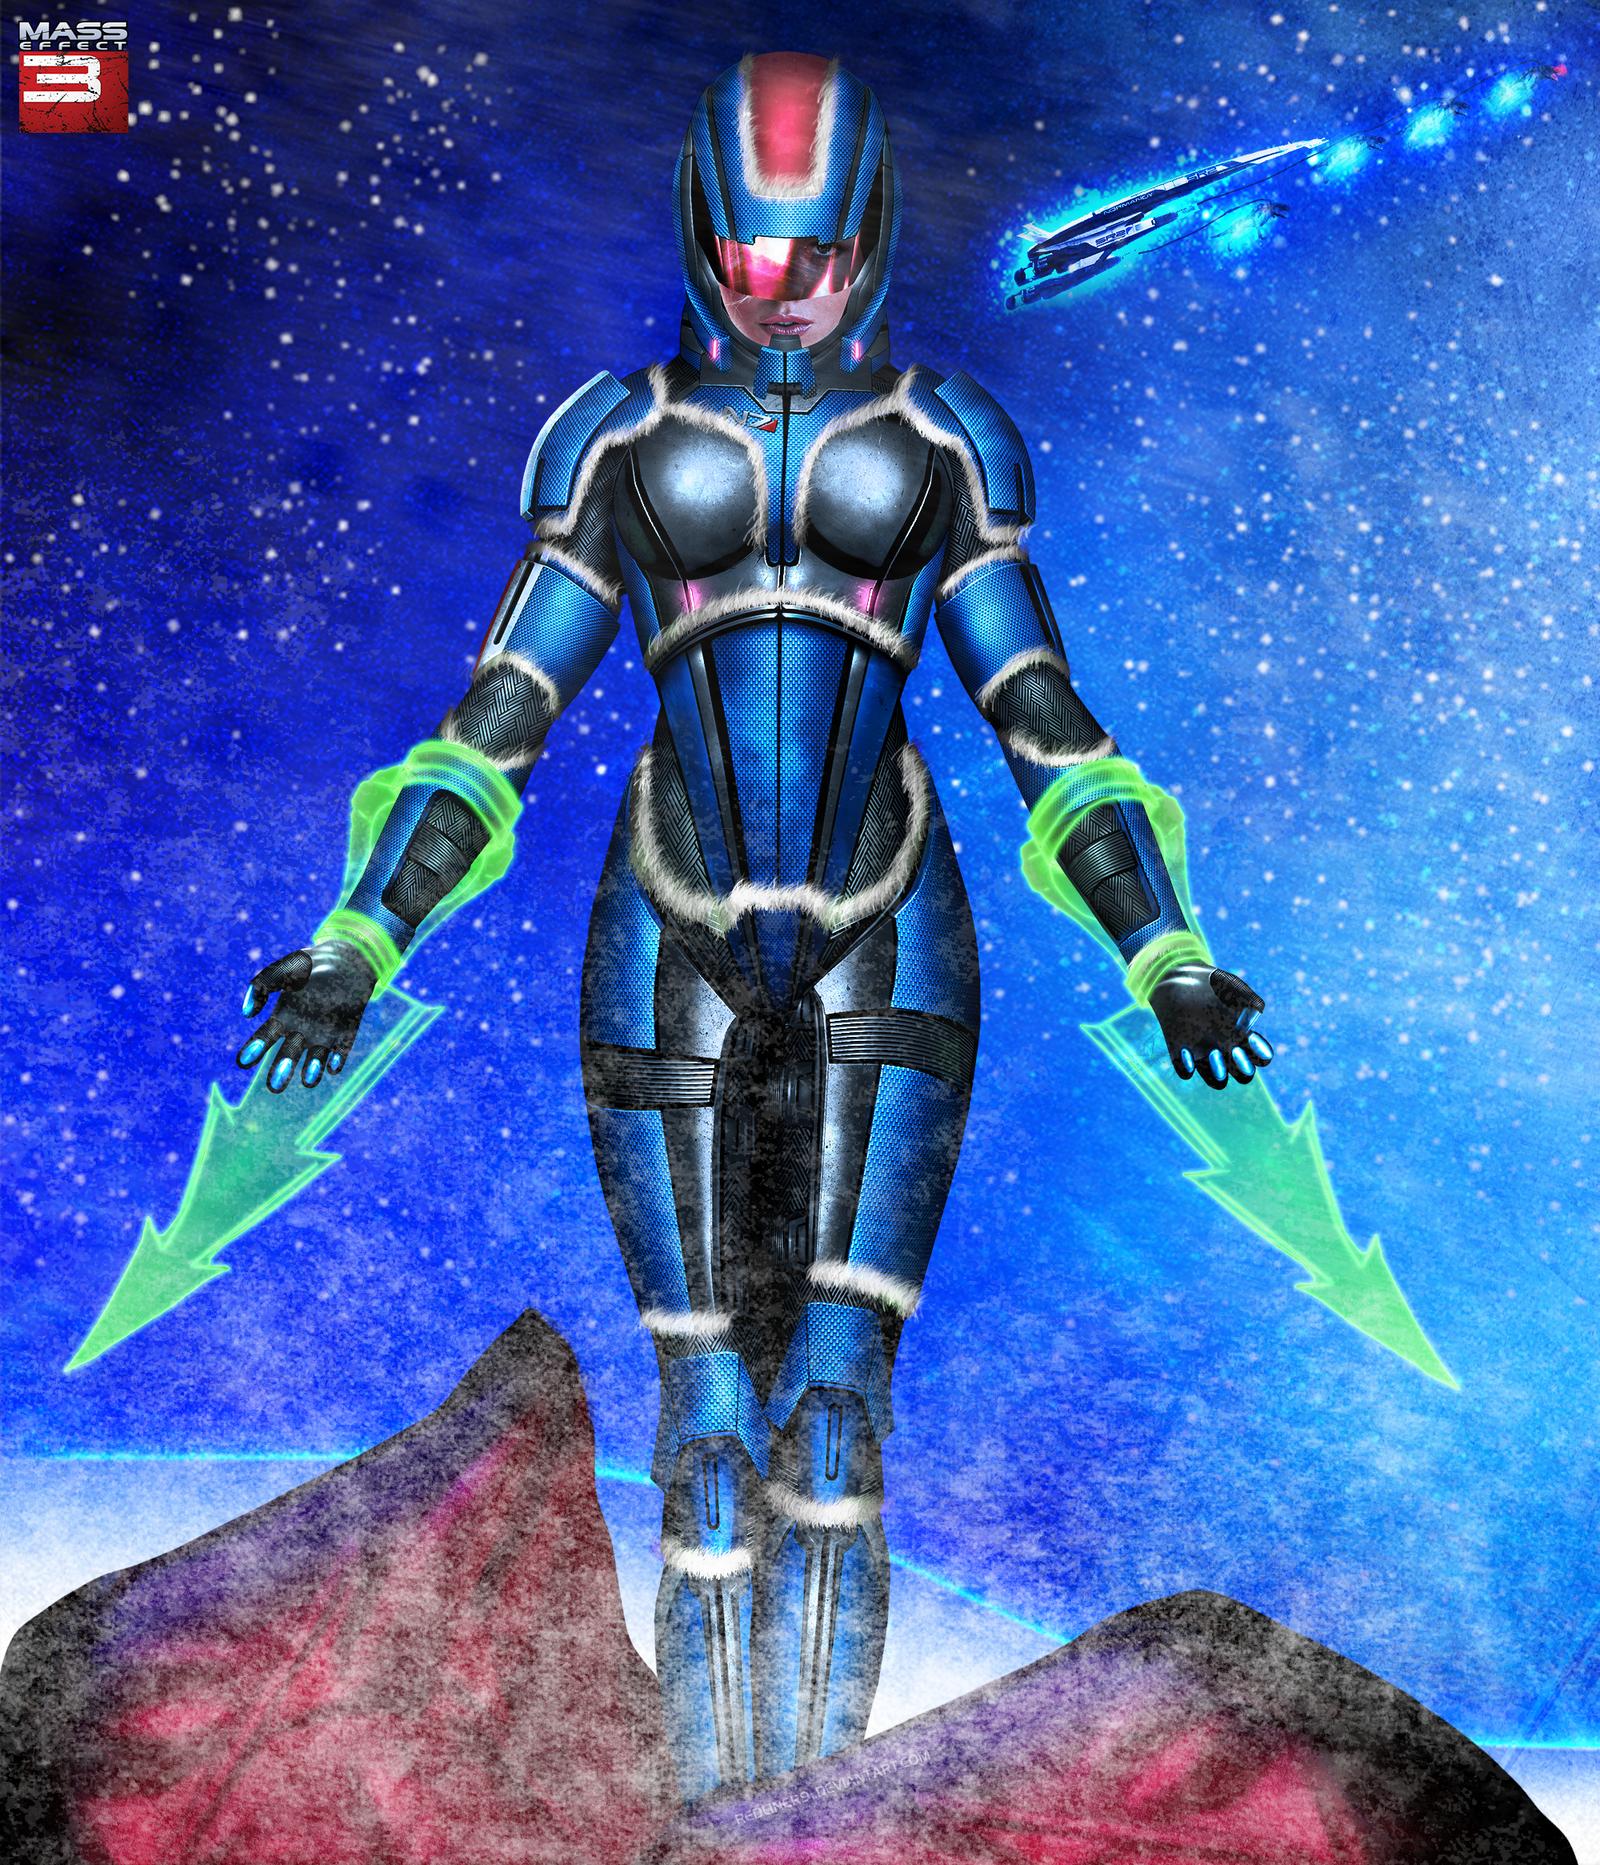 Mass Effect FemShep is Snow-Maiden by RedLineR91